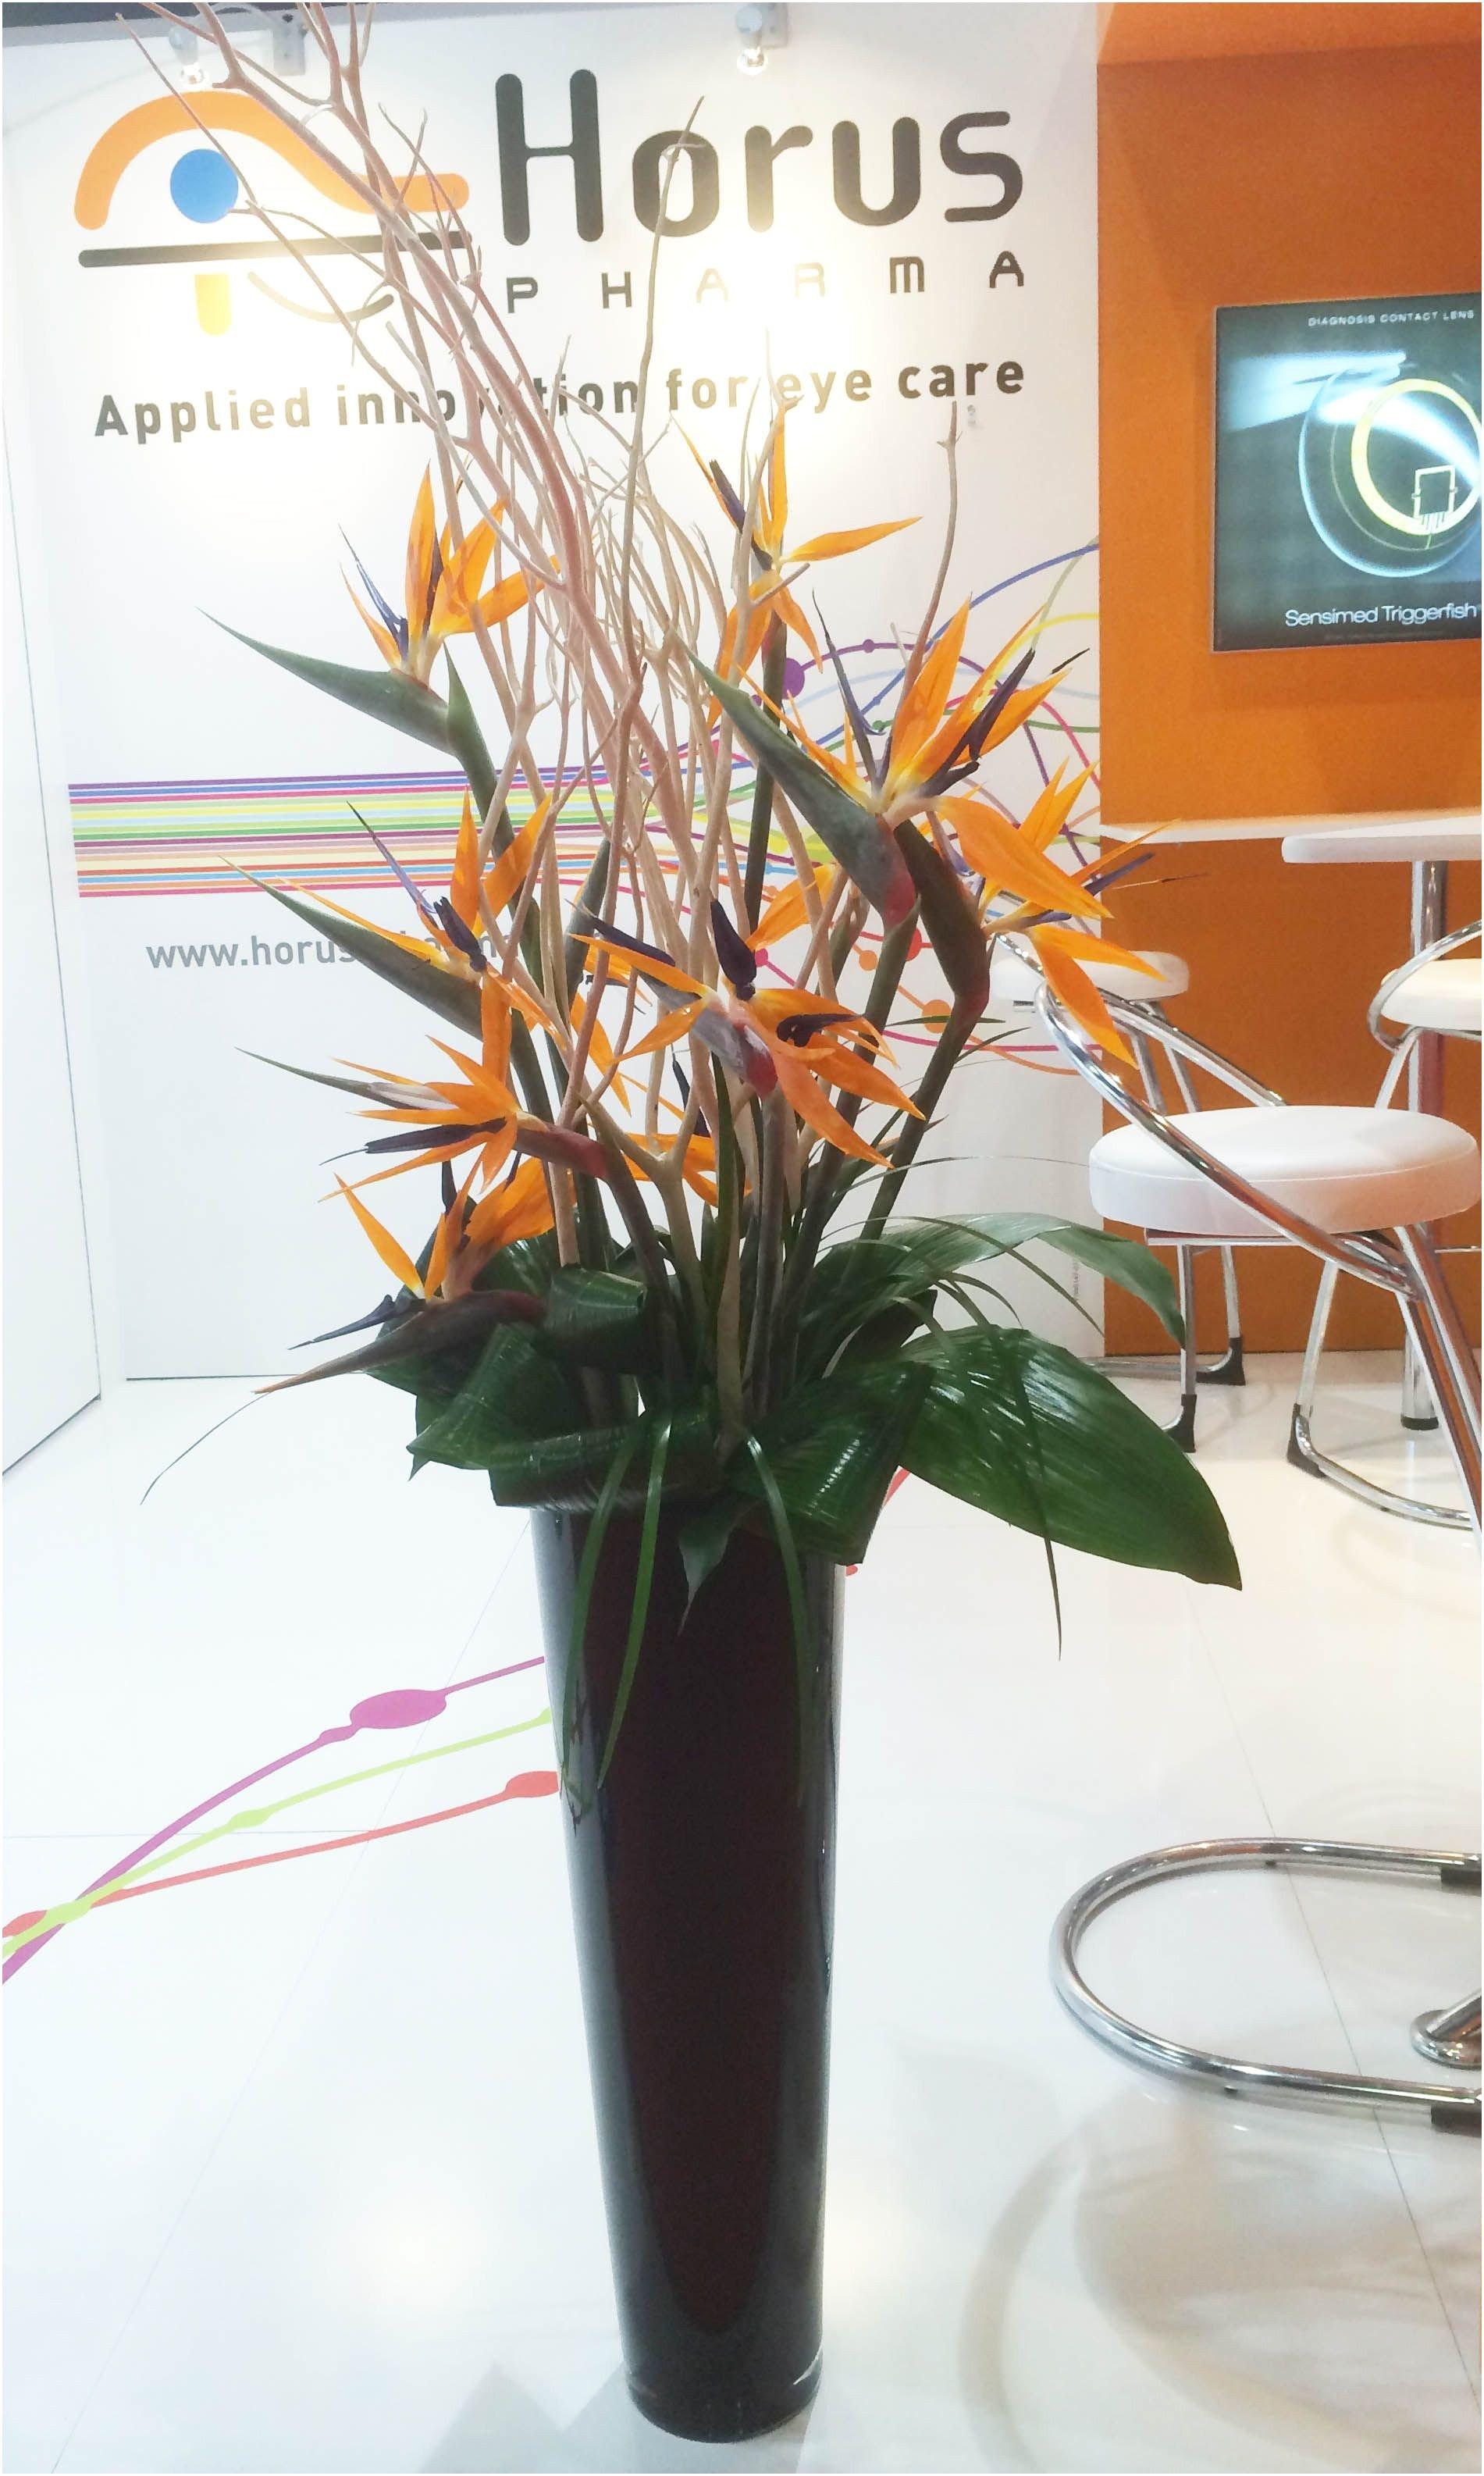 glass vase with silk flowers of orange glass vase photos silk flower arrangements unbelievable 2 od with orange glass vase photos silk flower arrangements unbelievable 2 od orange bird